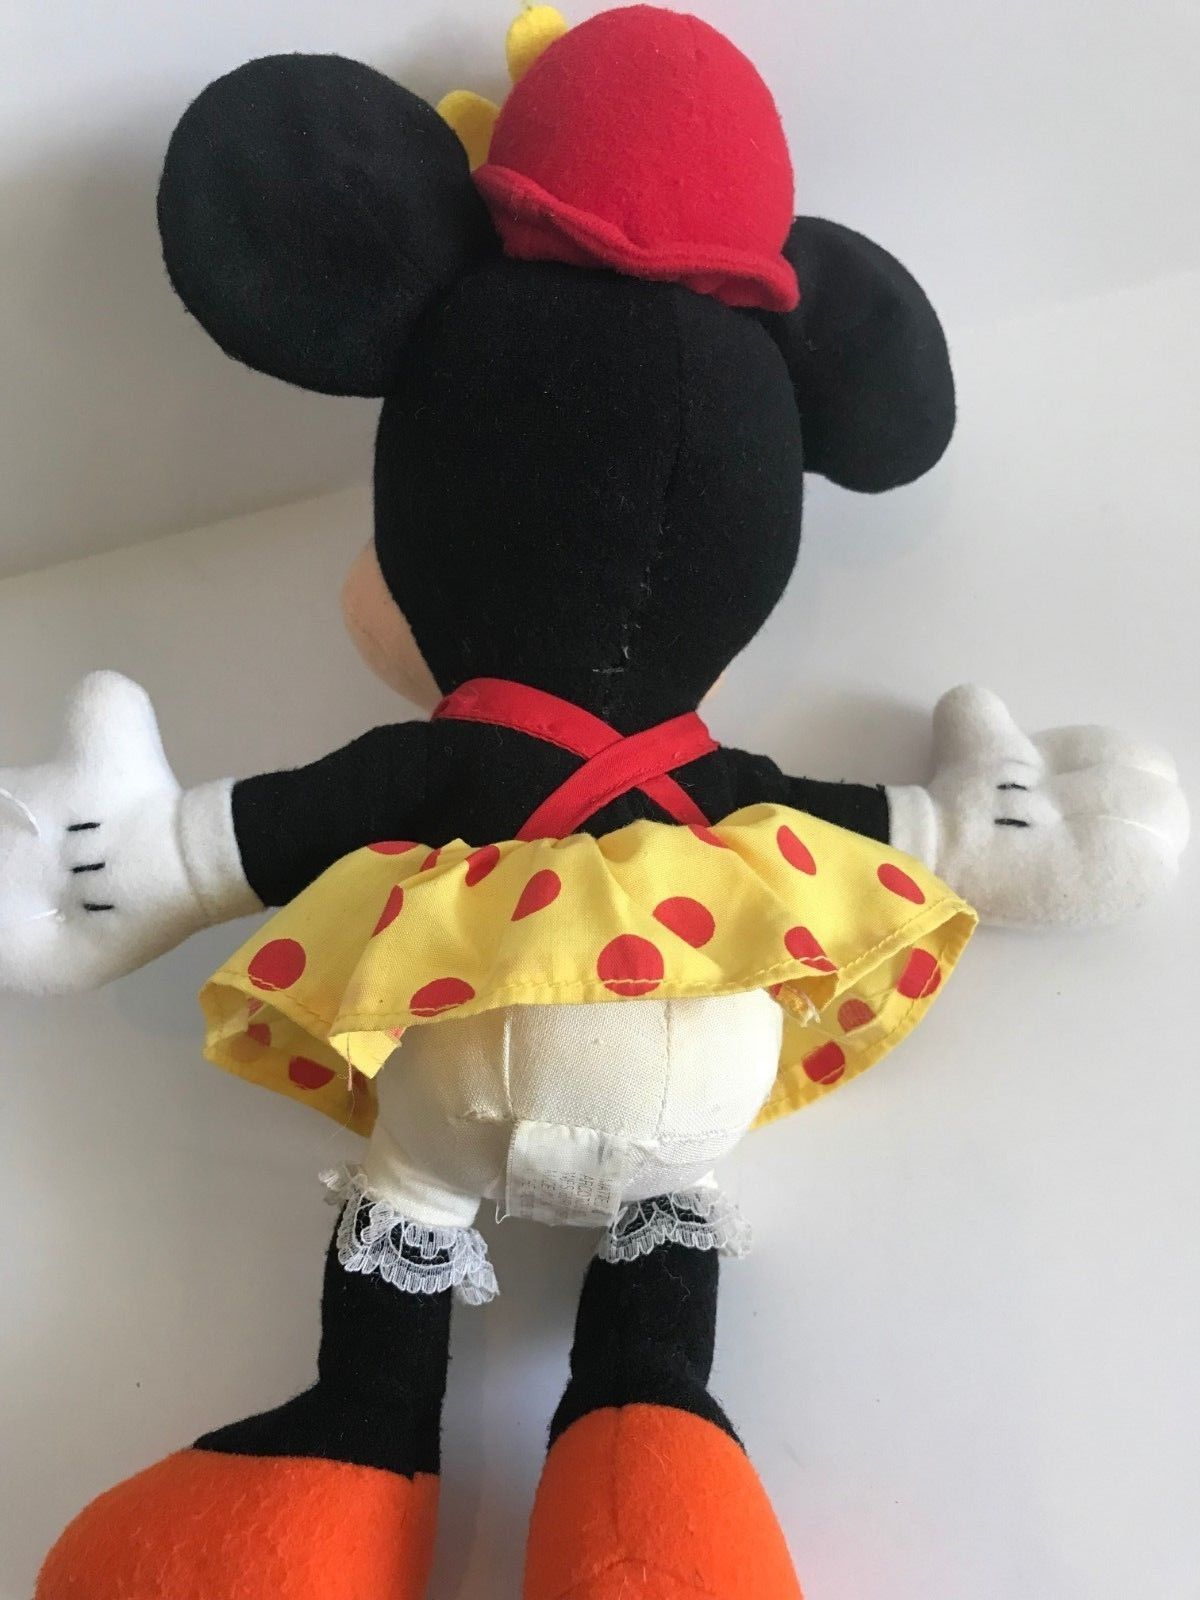 Mattel Arcotoys Minnie Mouse Yellow Red Polka Dot Flower Hat Plush Stuffed Doll image 8